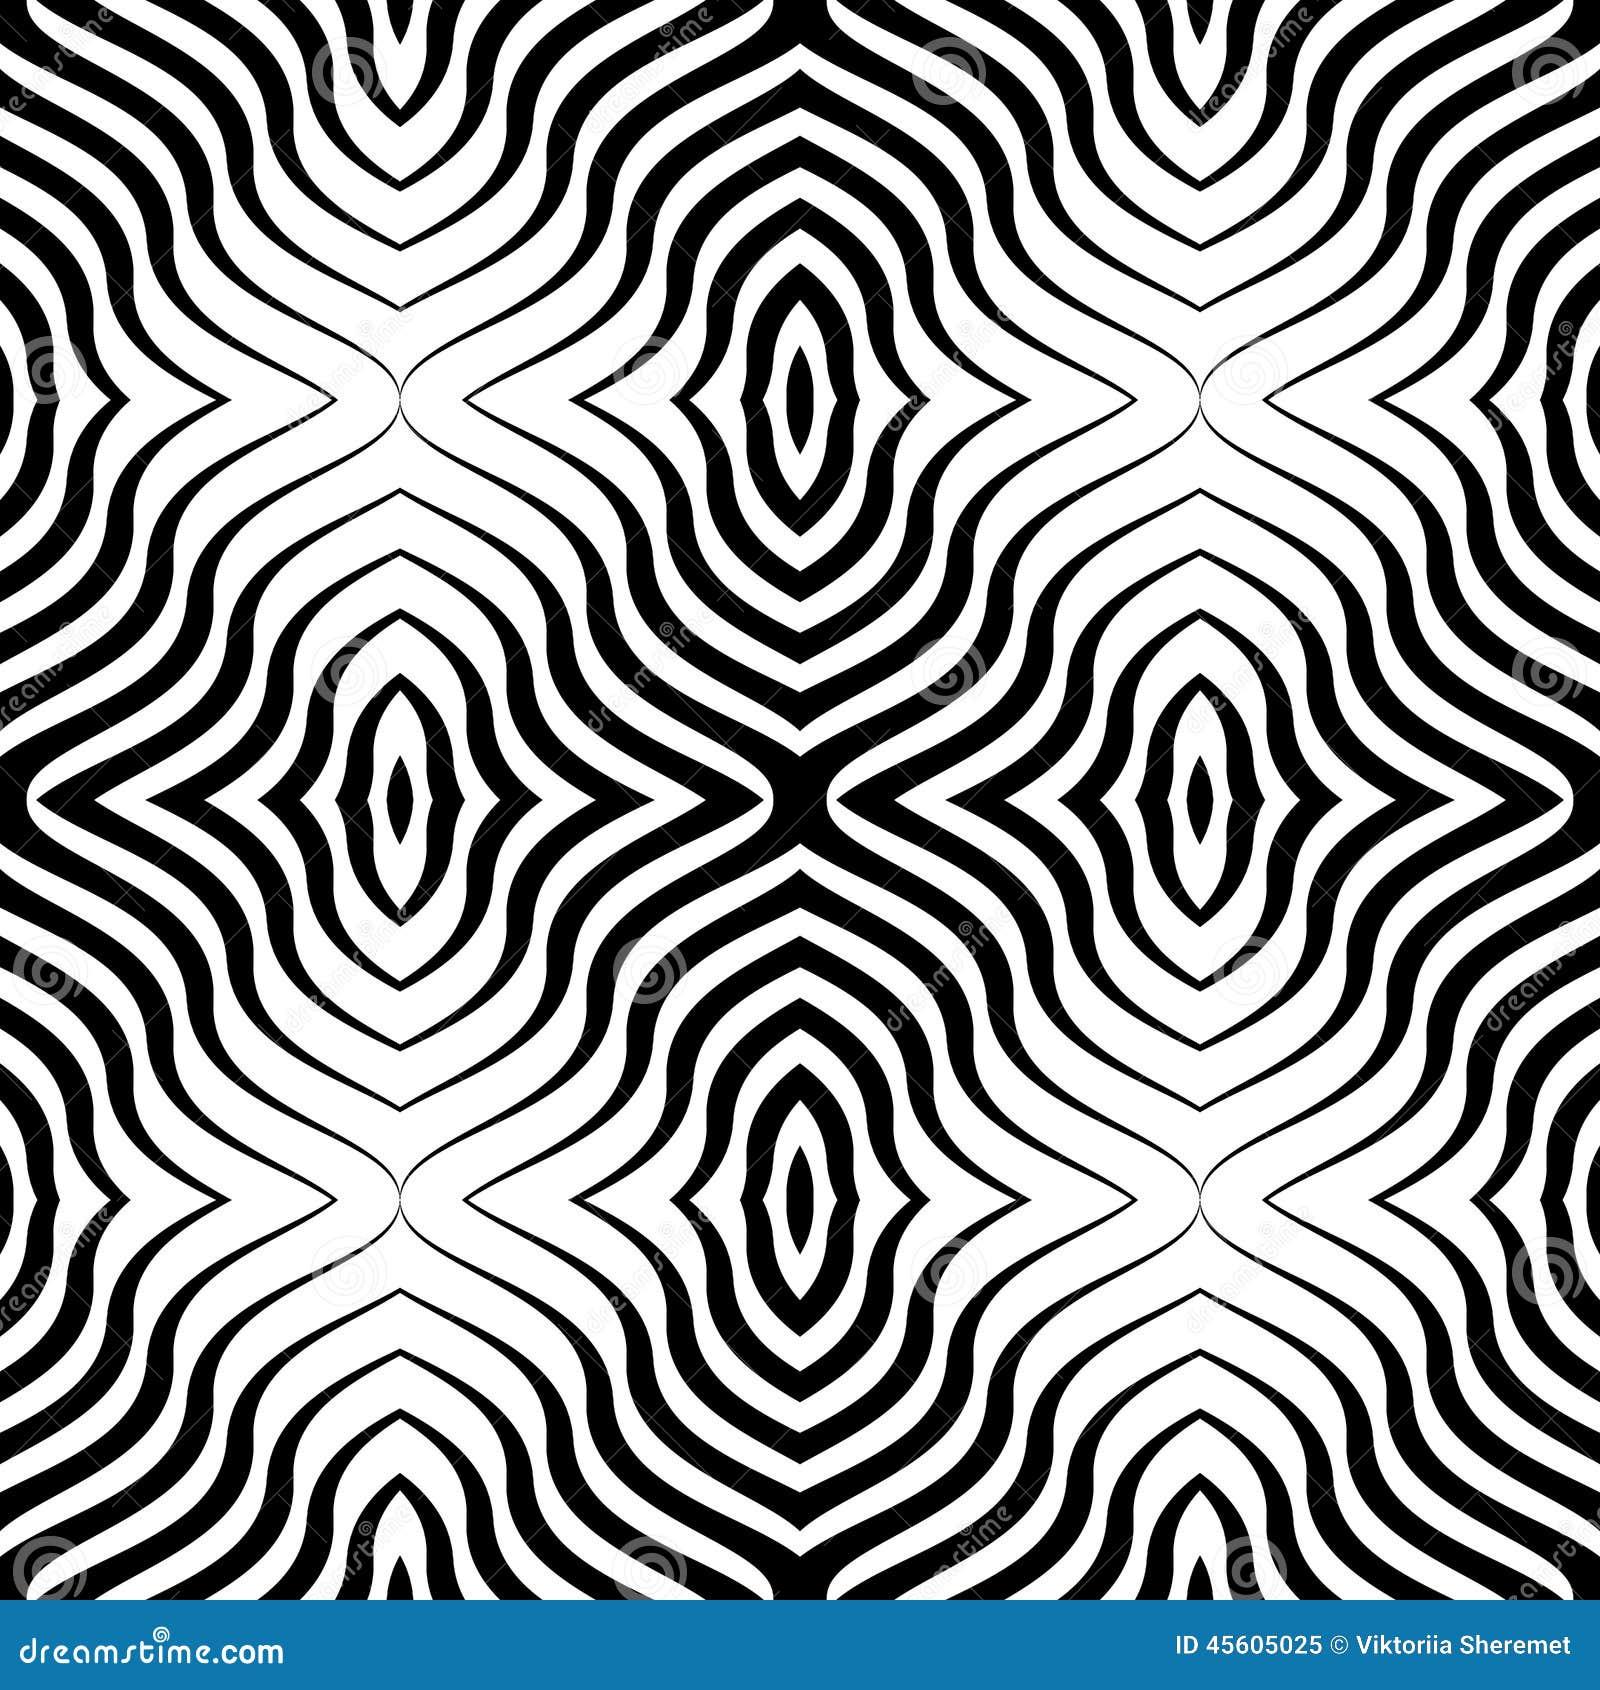 Line Design Art Rubric : Op art vector seamless geometric pattern